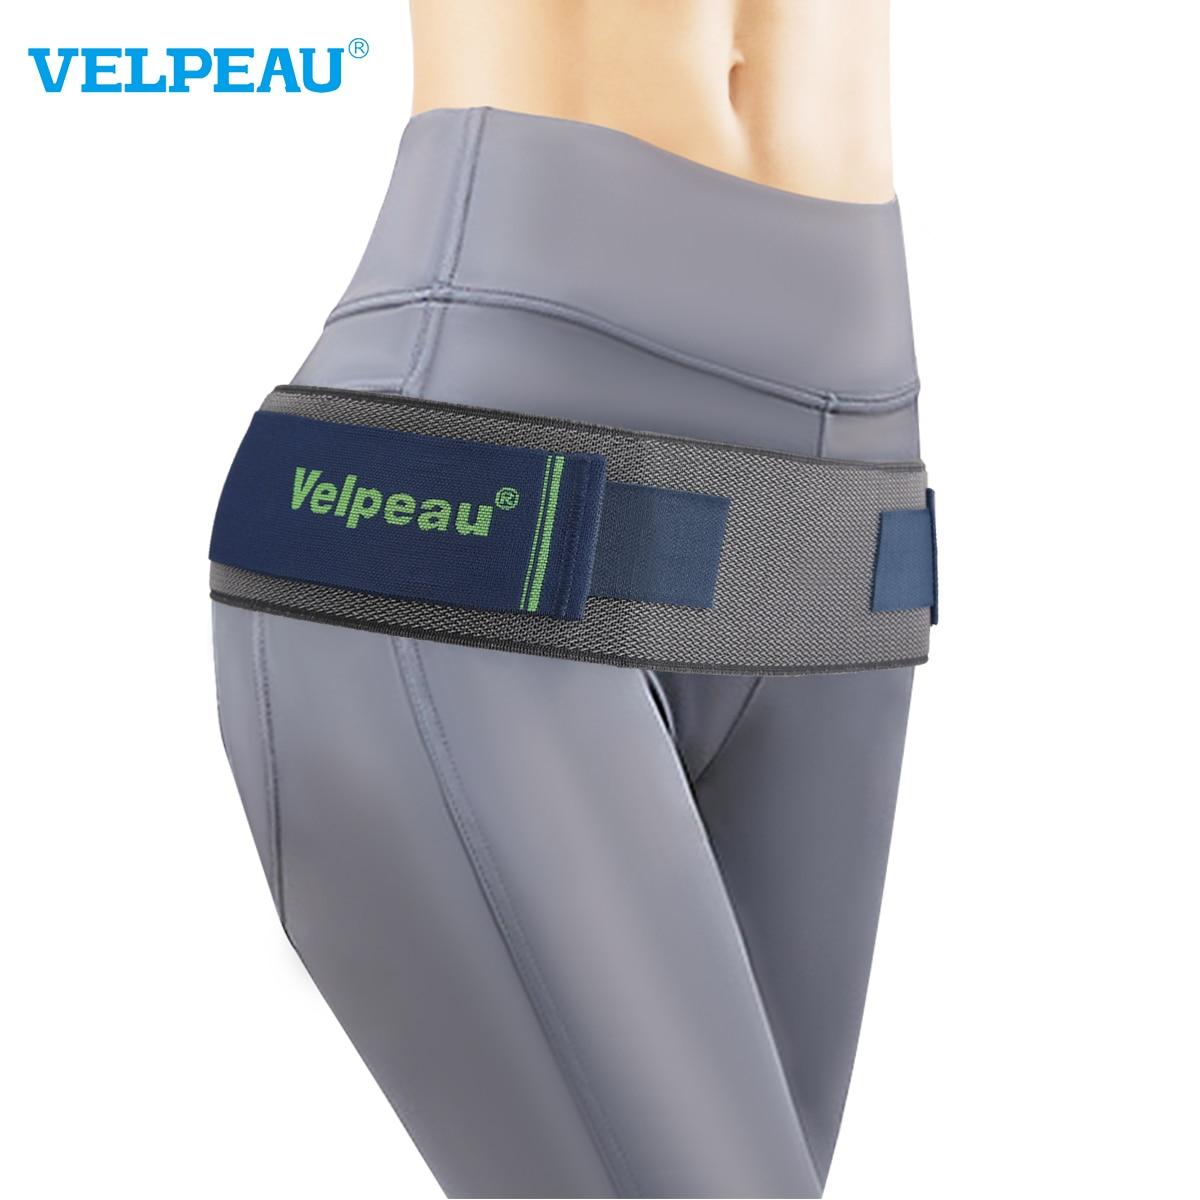 VELPEAU Crotch Girdle Postpartum Pelvic Girdle Crotch Hip Lifting Pelvic Repair Correction Belt High Elasticity, Lightweight and